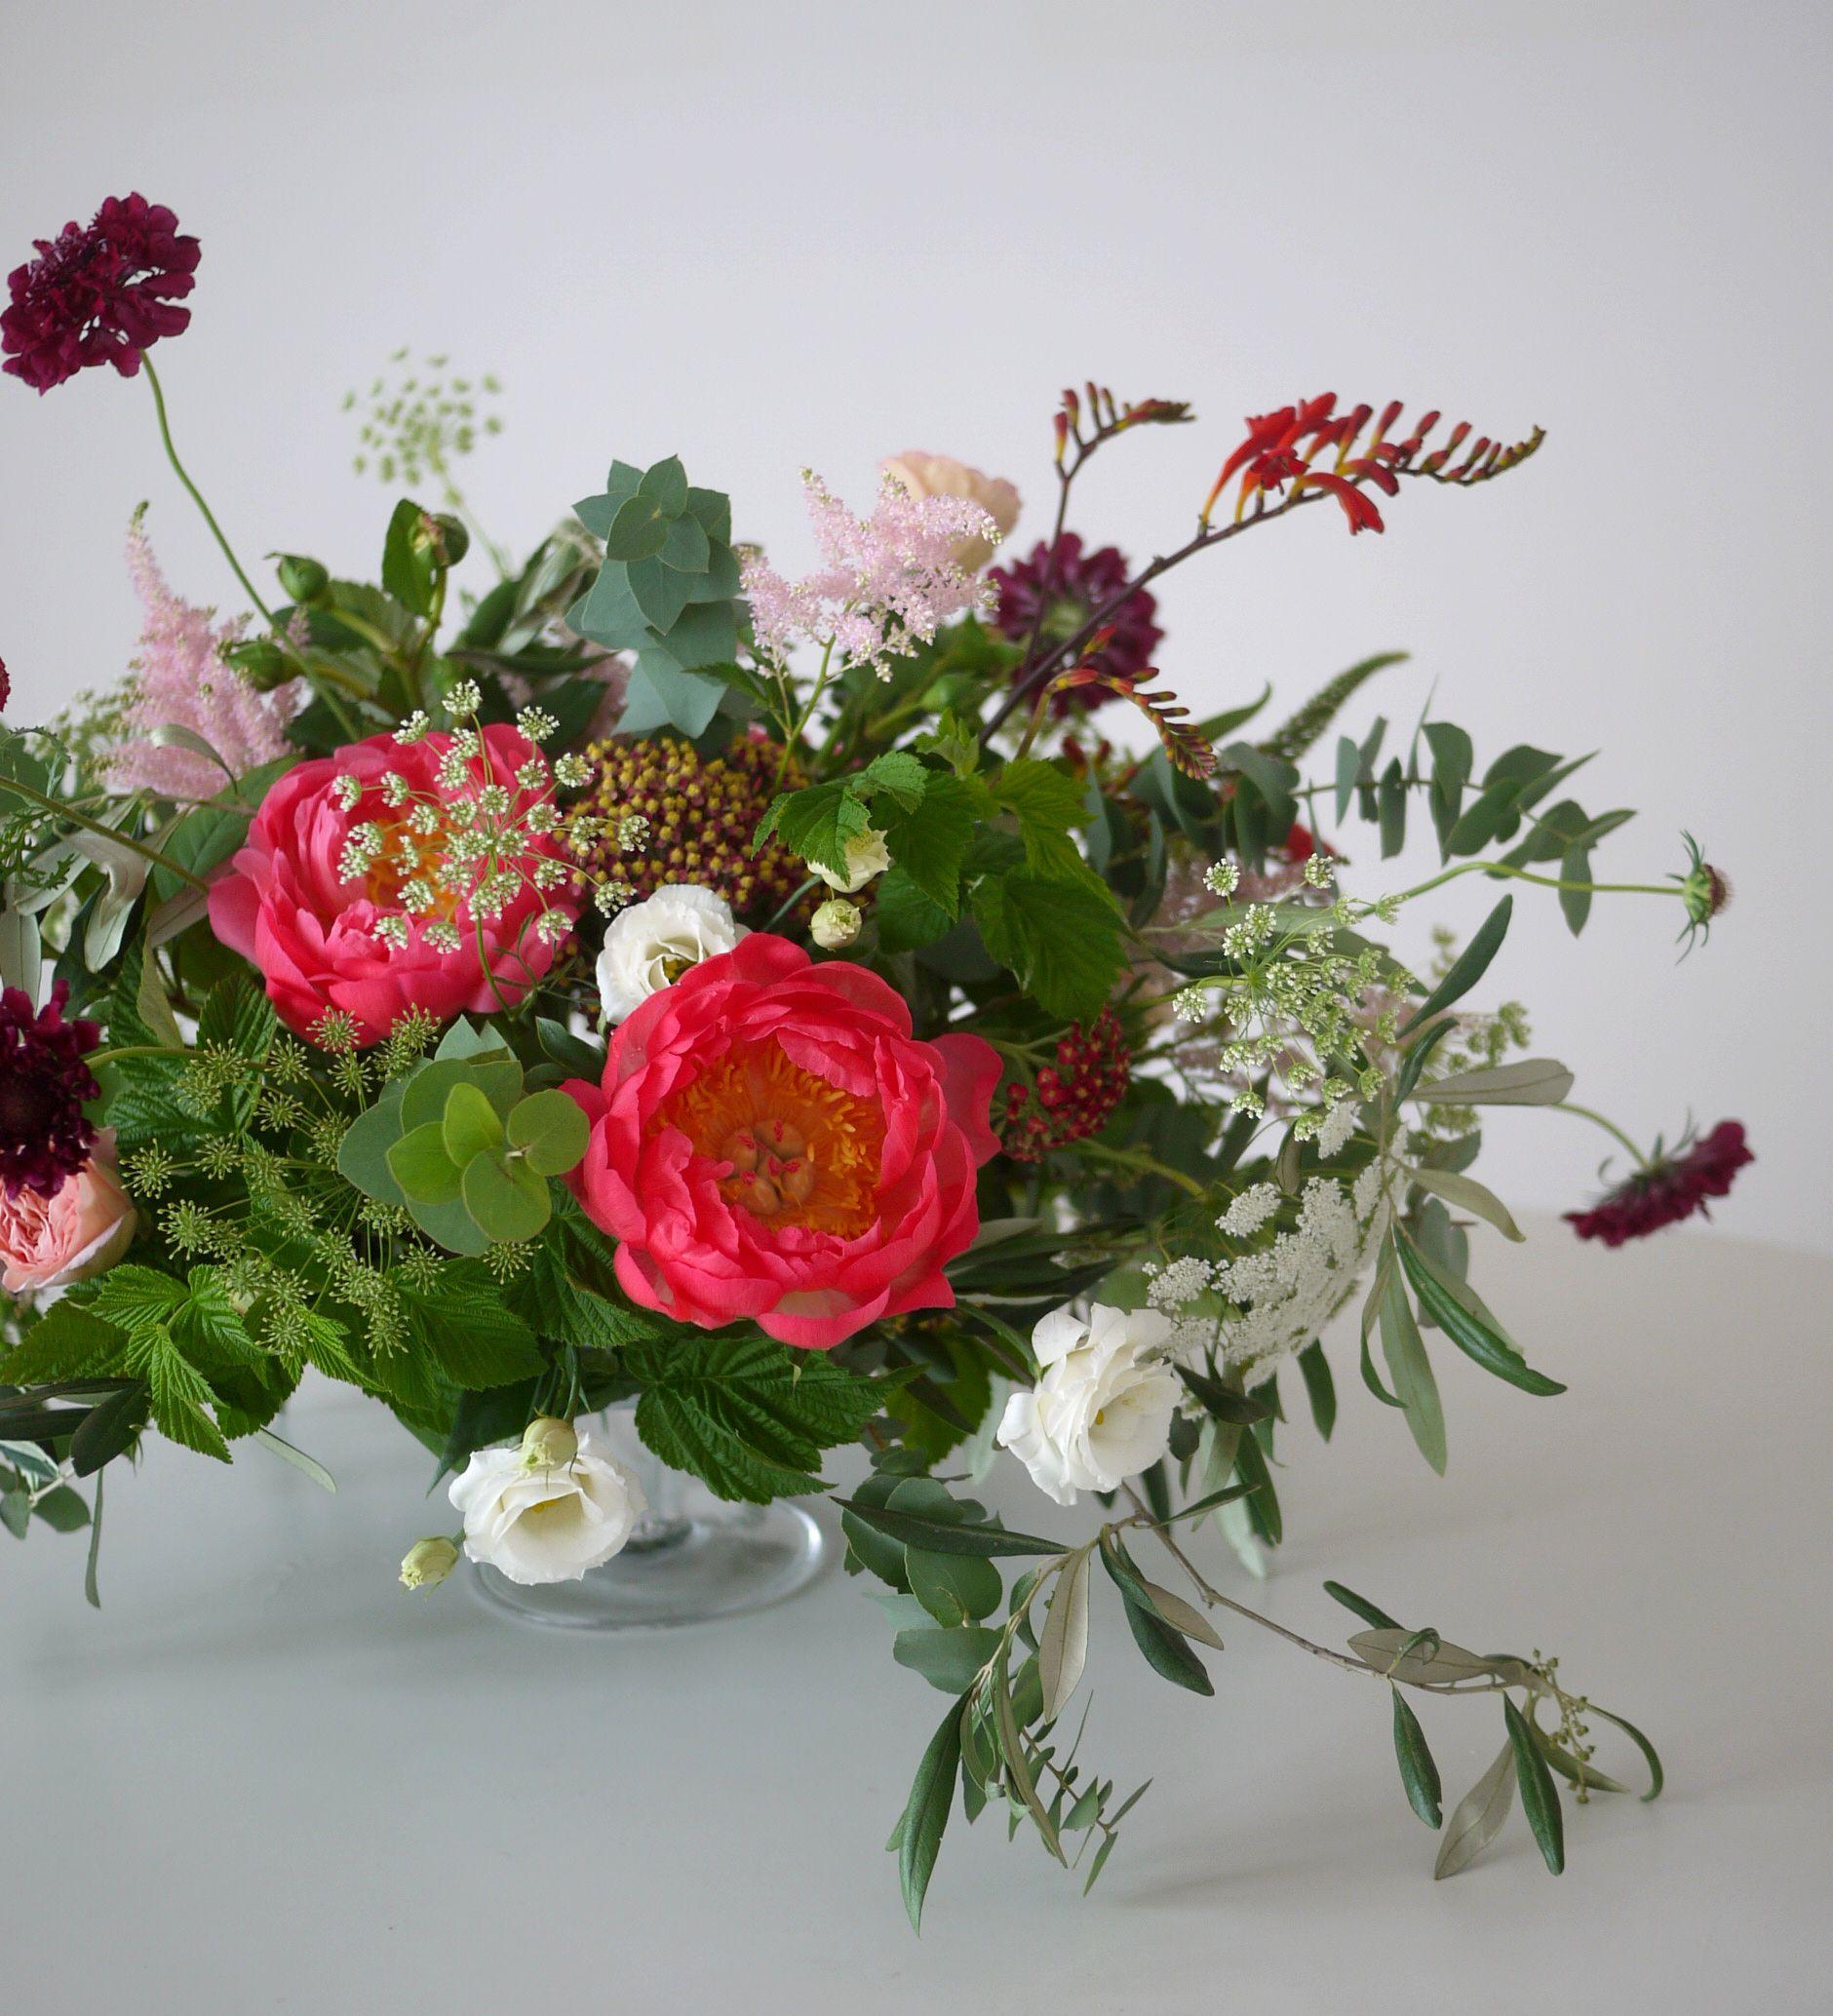 composition florale n°411 | akiko usami